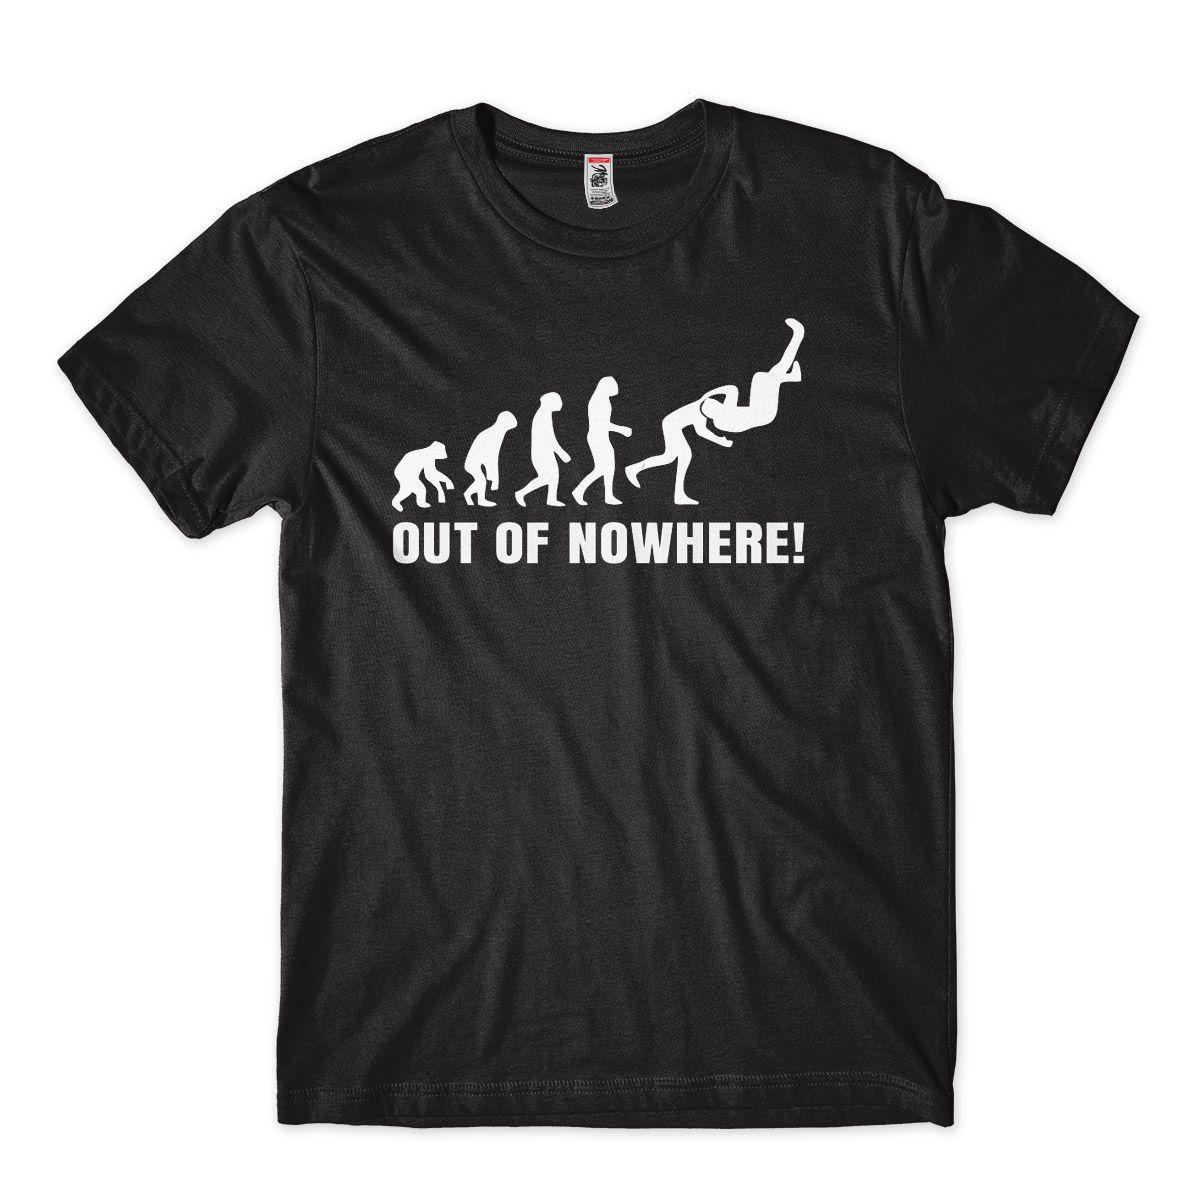 Camiseta Wwe Randy Orton Out Of Nowhere Camisa Masculina